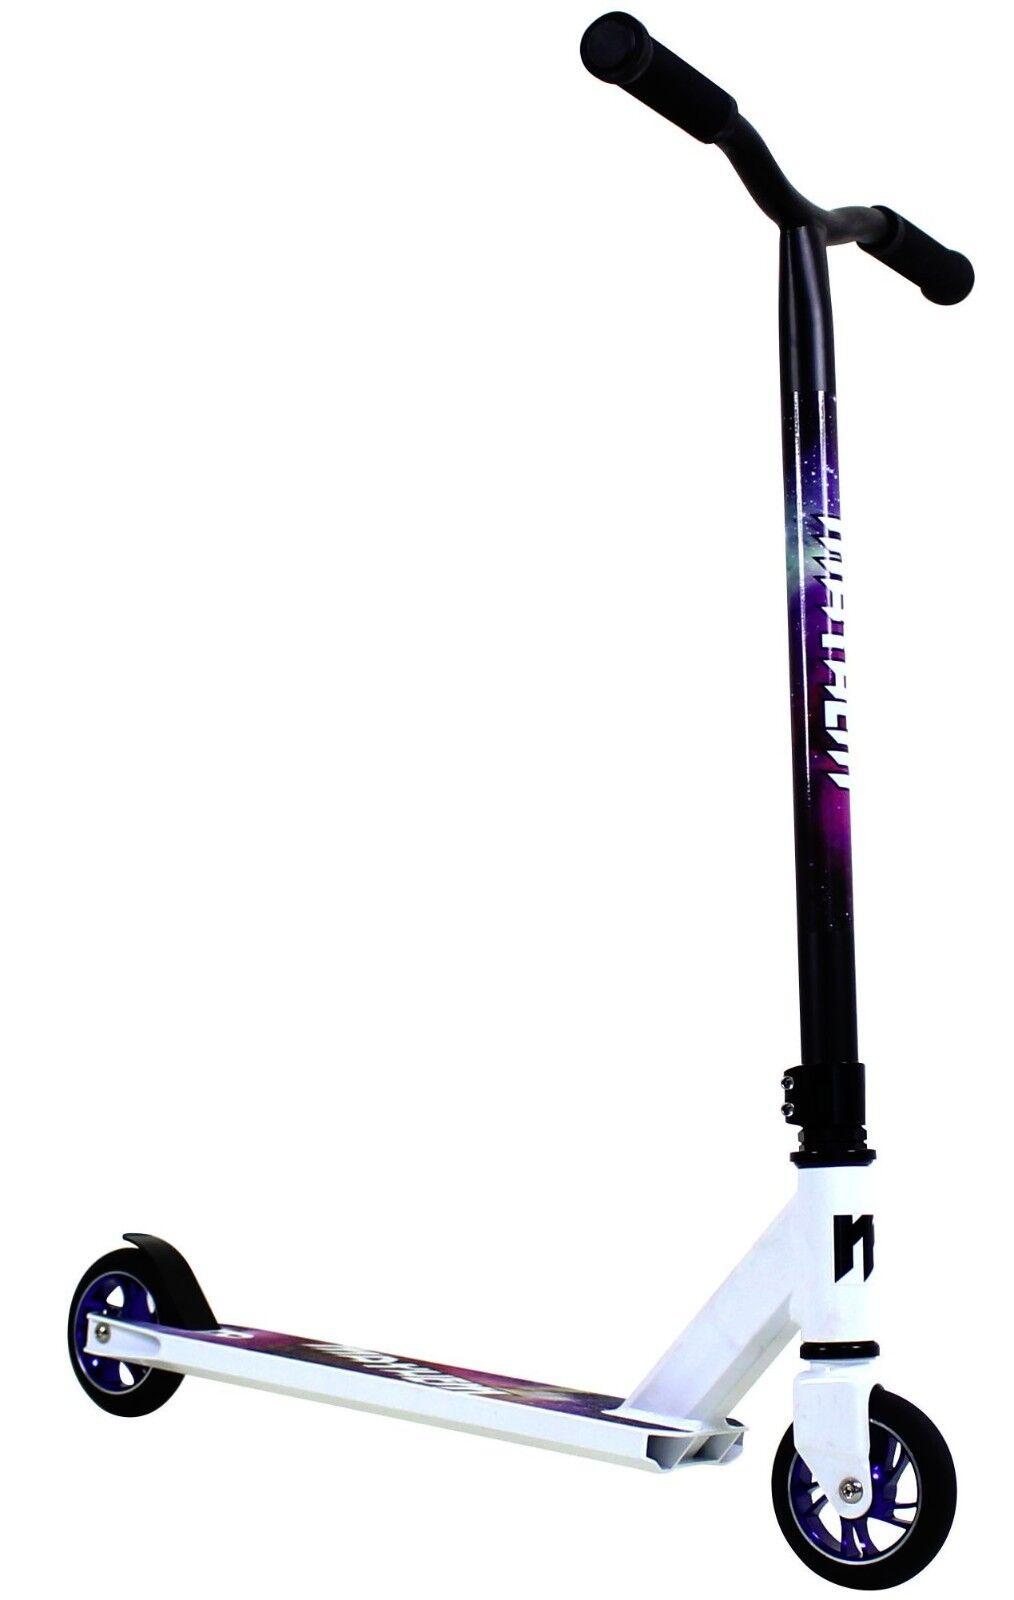 Mayhem Galaxy Pro Fixed Bar Stunt Kick Scooter White NEW SAME DAY SHIP